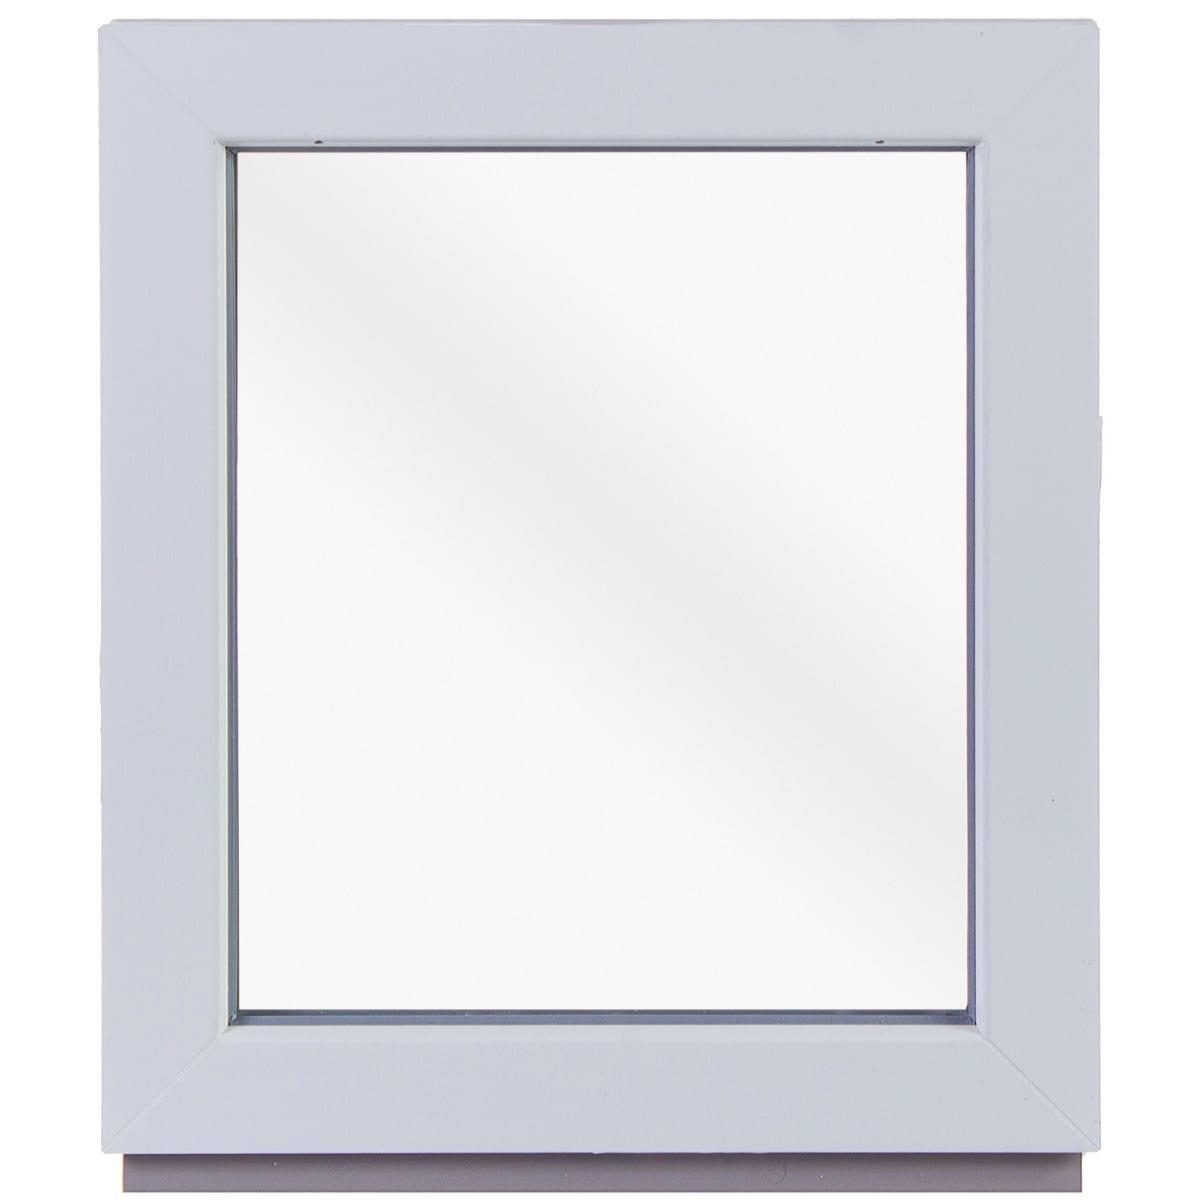 Окно ПВХ одностворчатое 65(62)x60 см глухое